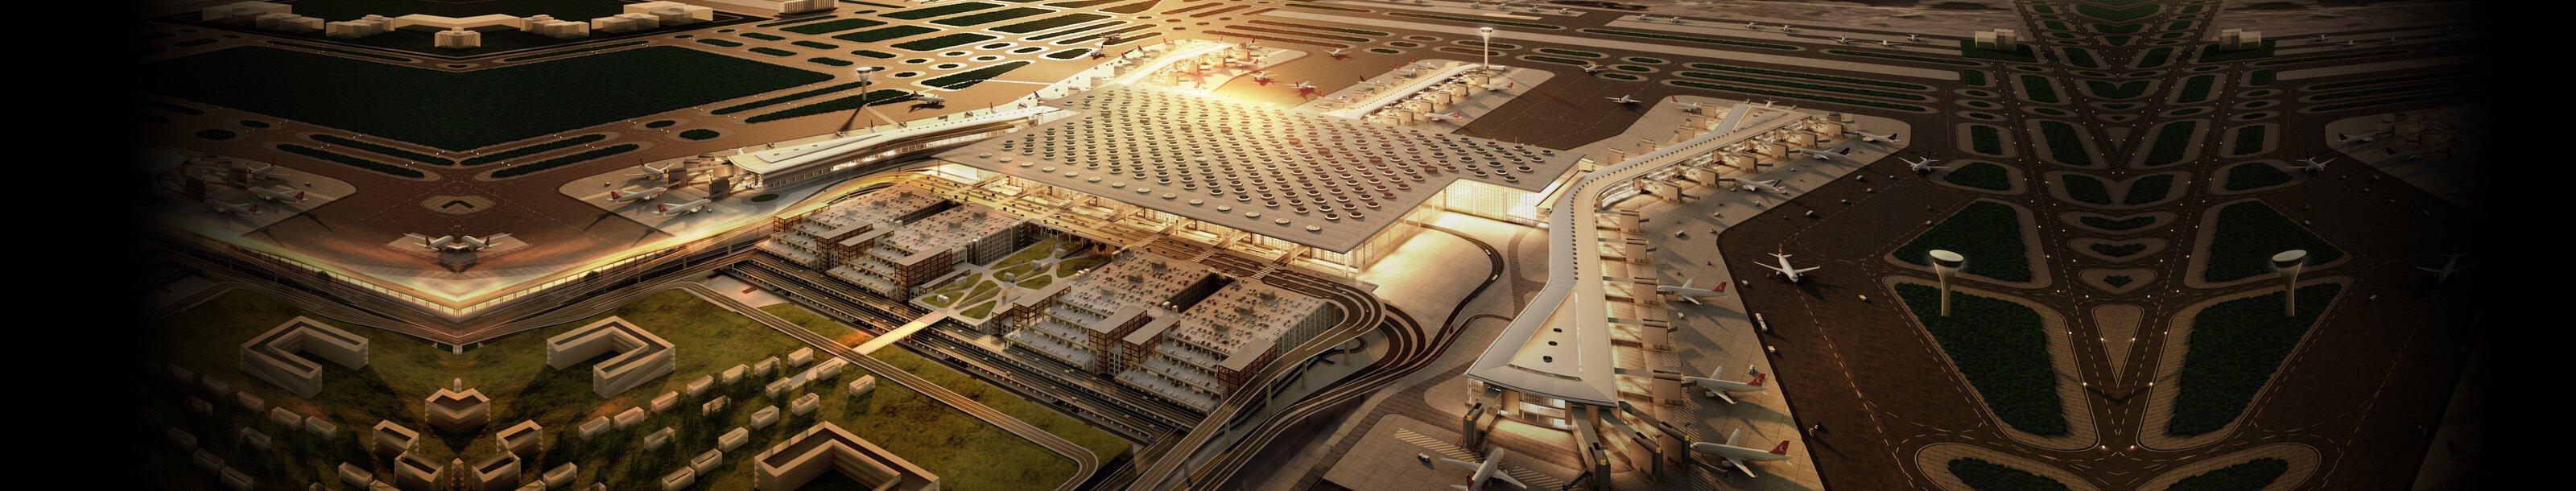 istanbul airport thy eae